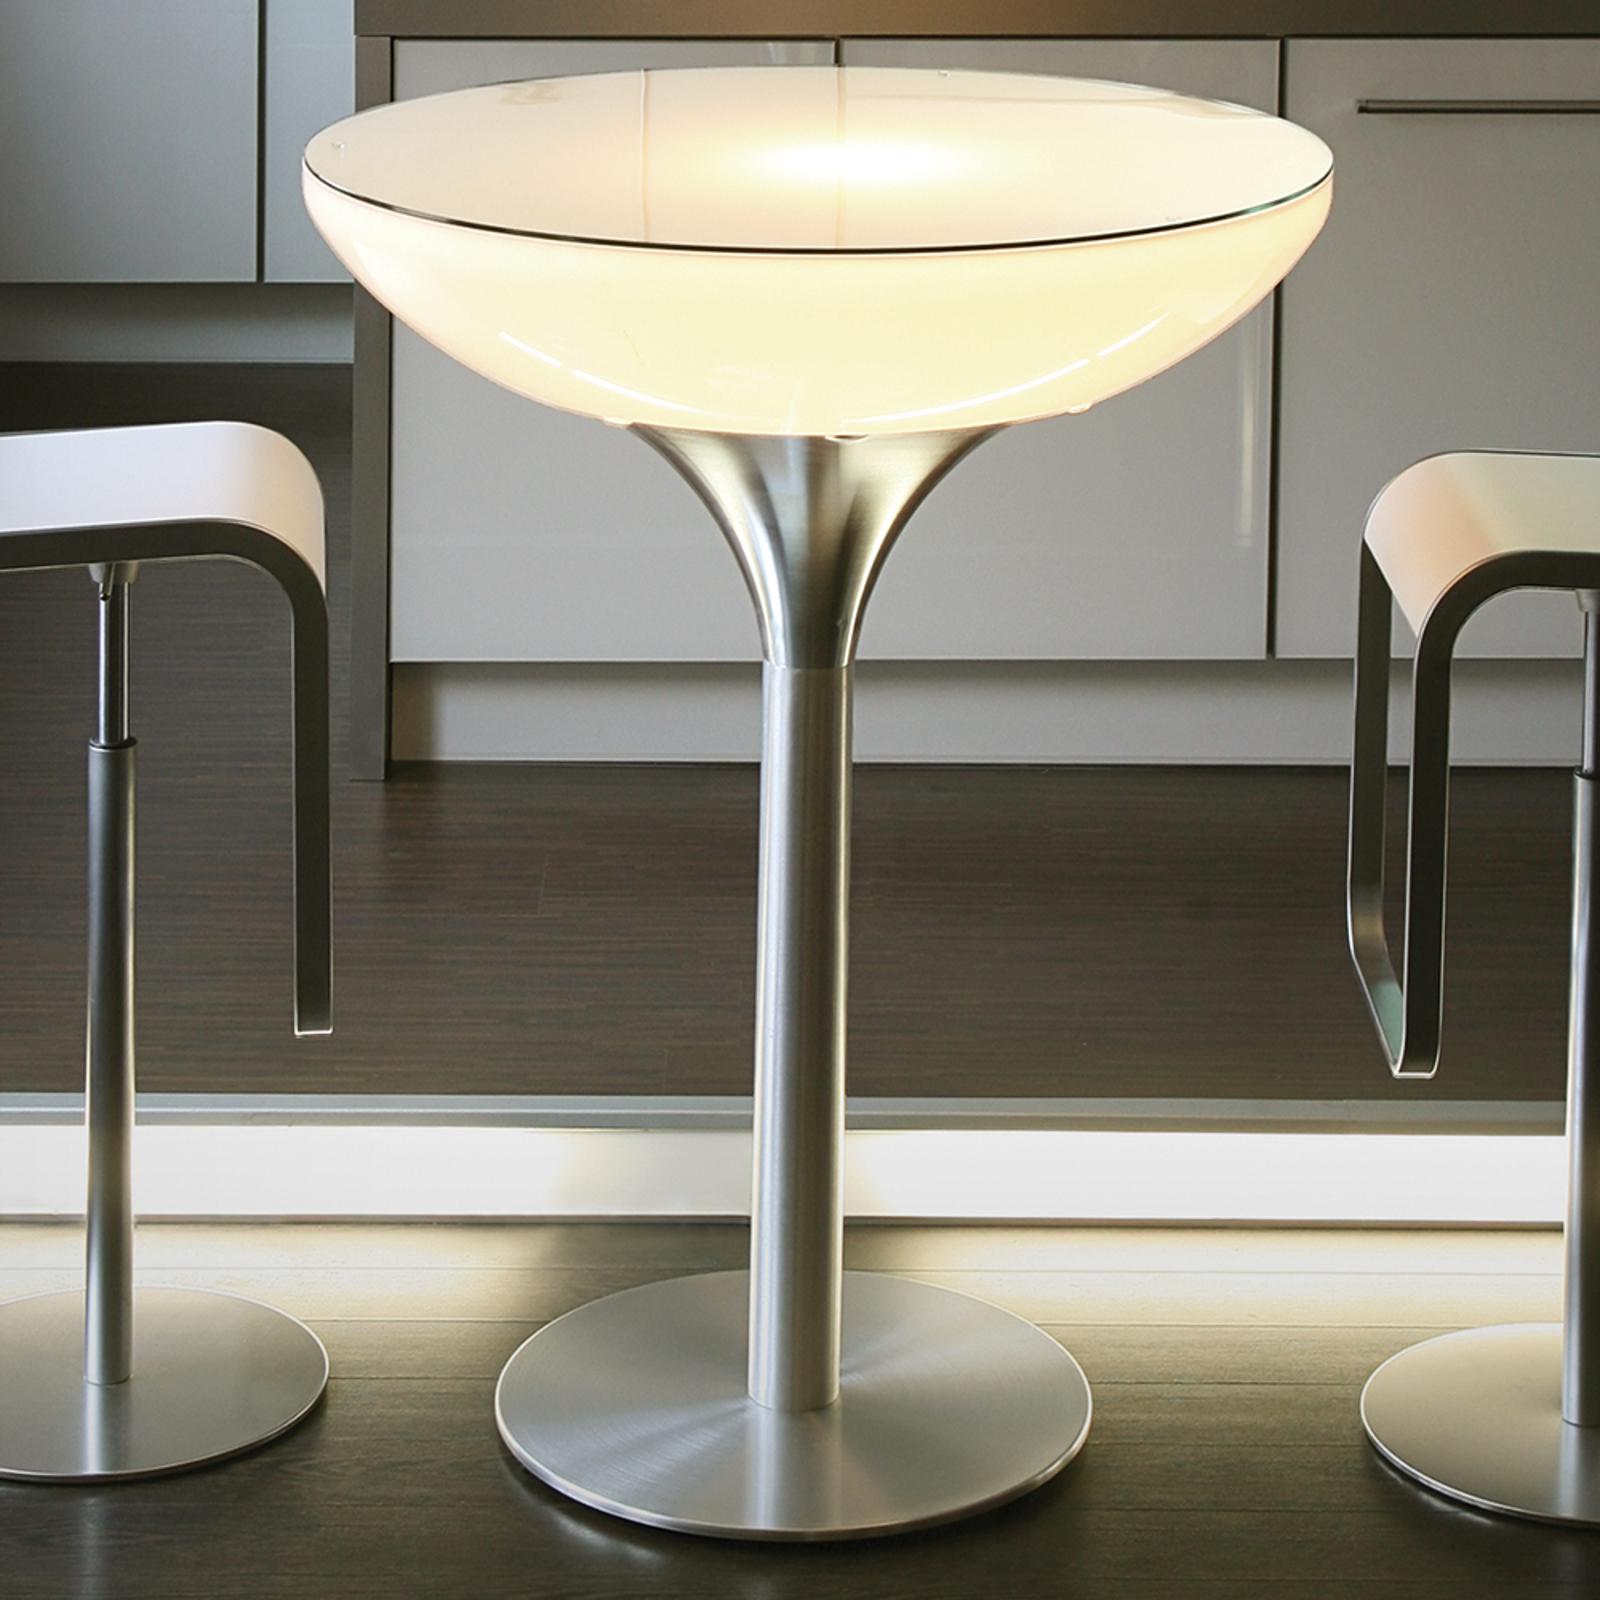 mangefarget lysende loungebord LED Pro 105 cm